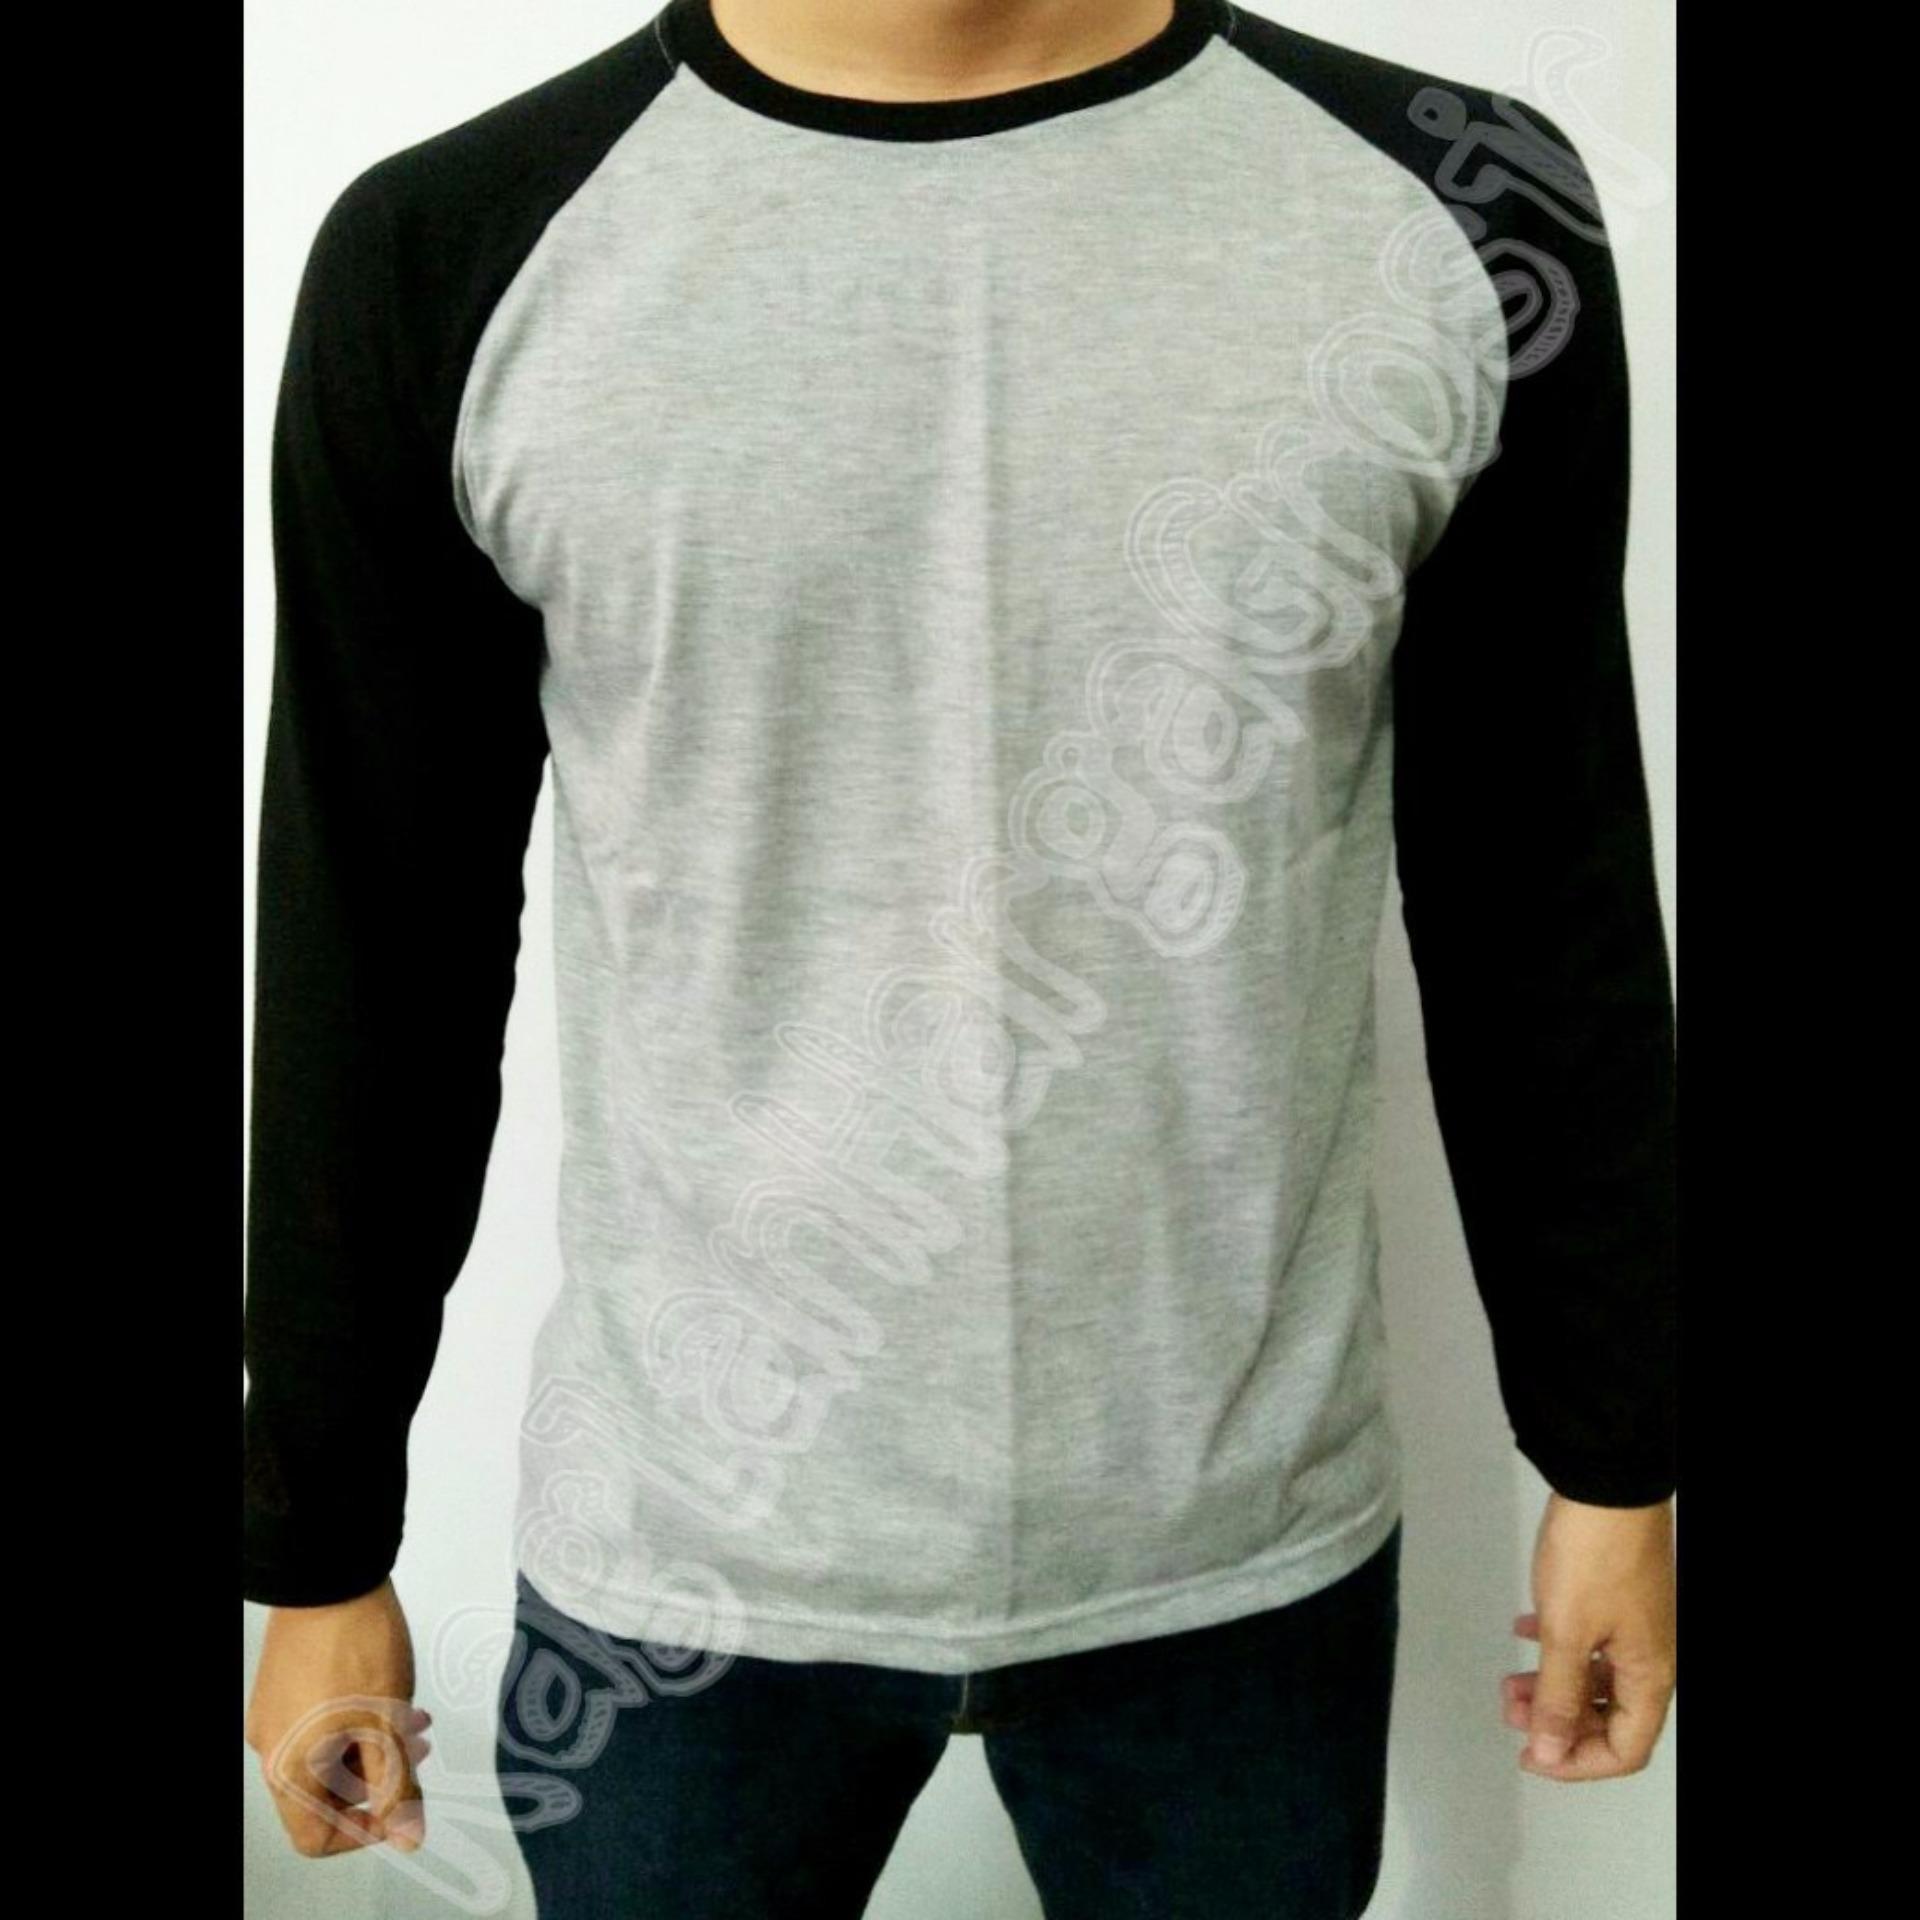 Bahan 100 Cotton Combed 30s Soft Nyaman Dan T Grosis Kaos Distro Premium Plastisol Bandung Raglan Lengan Panjang Unisex